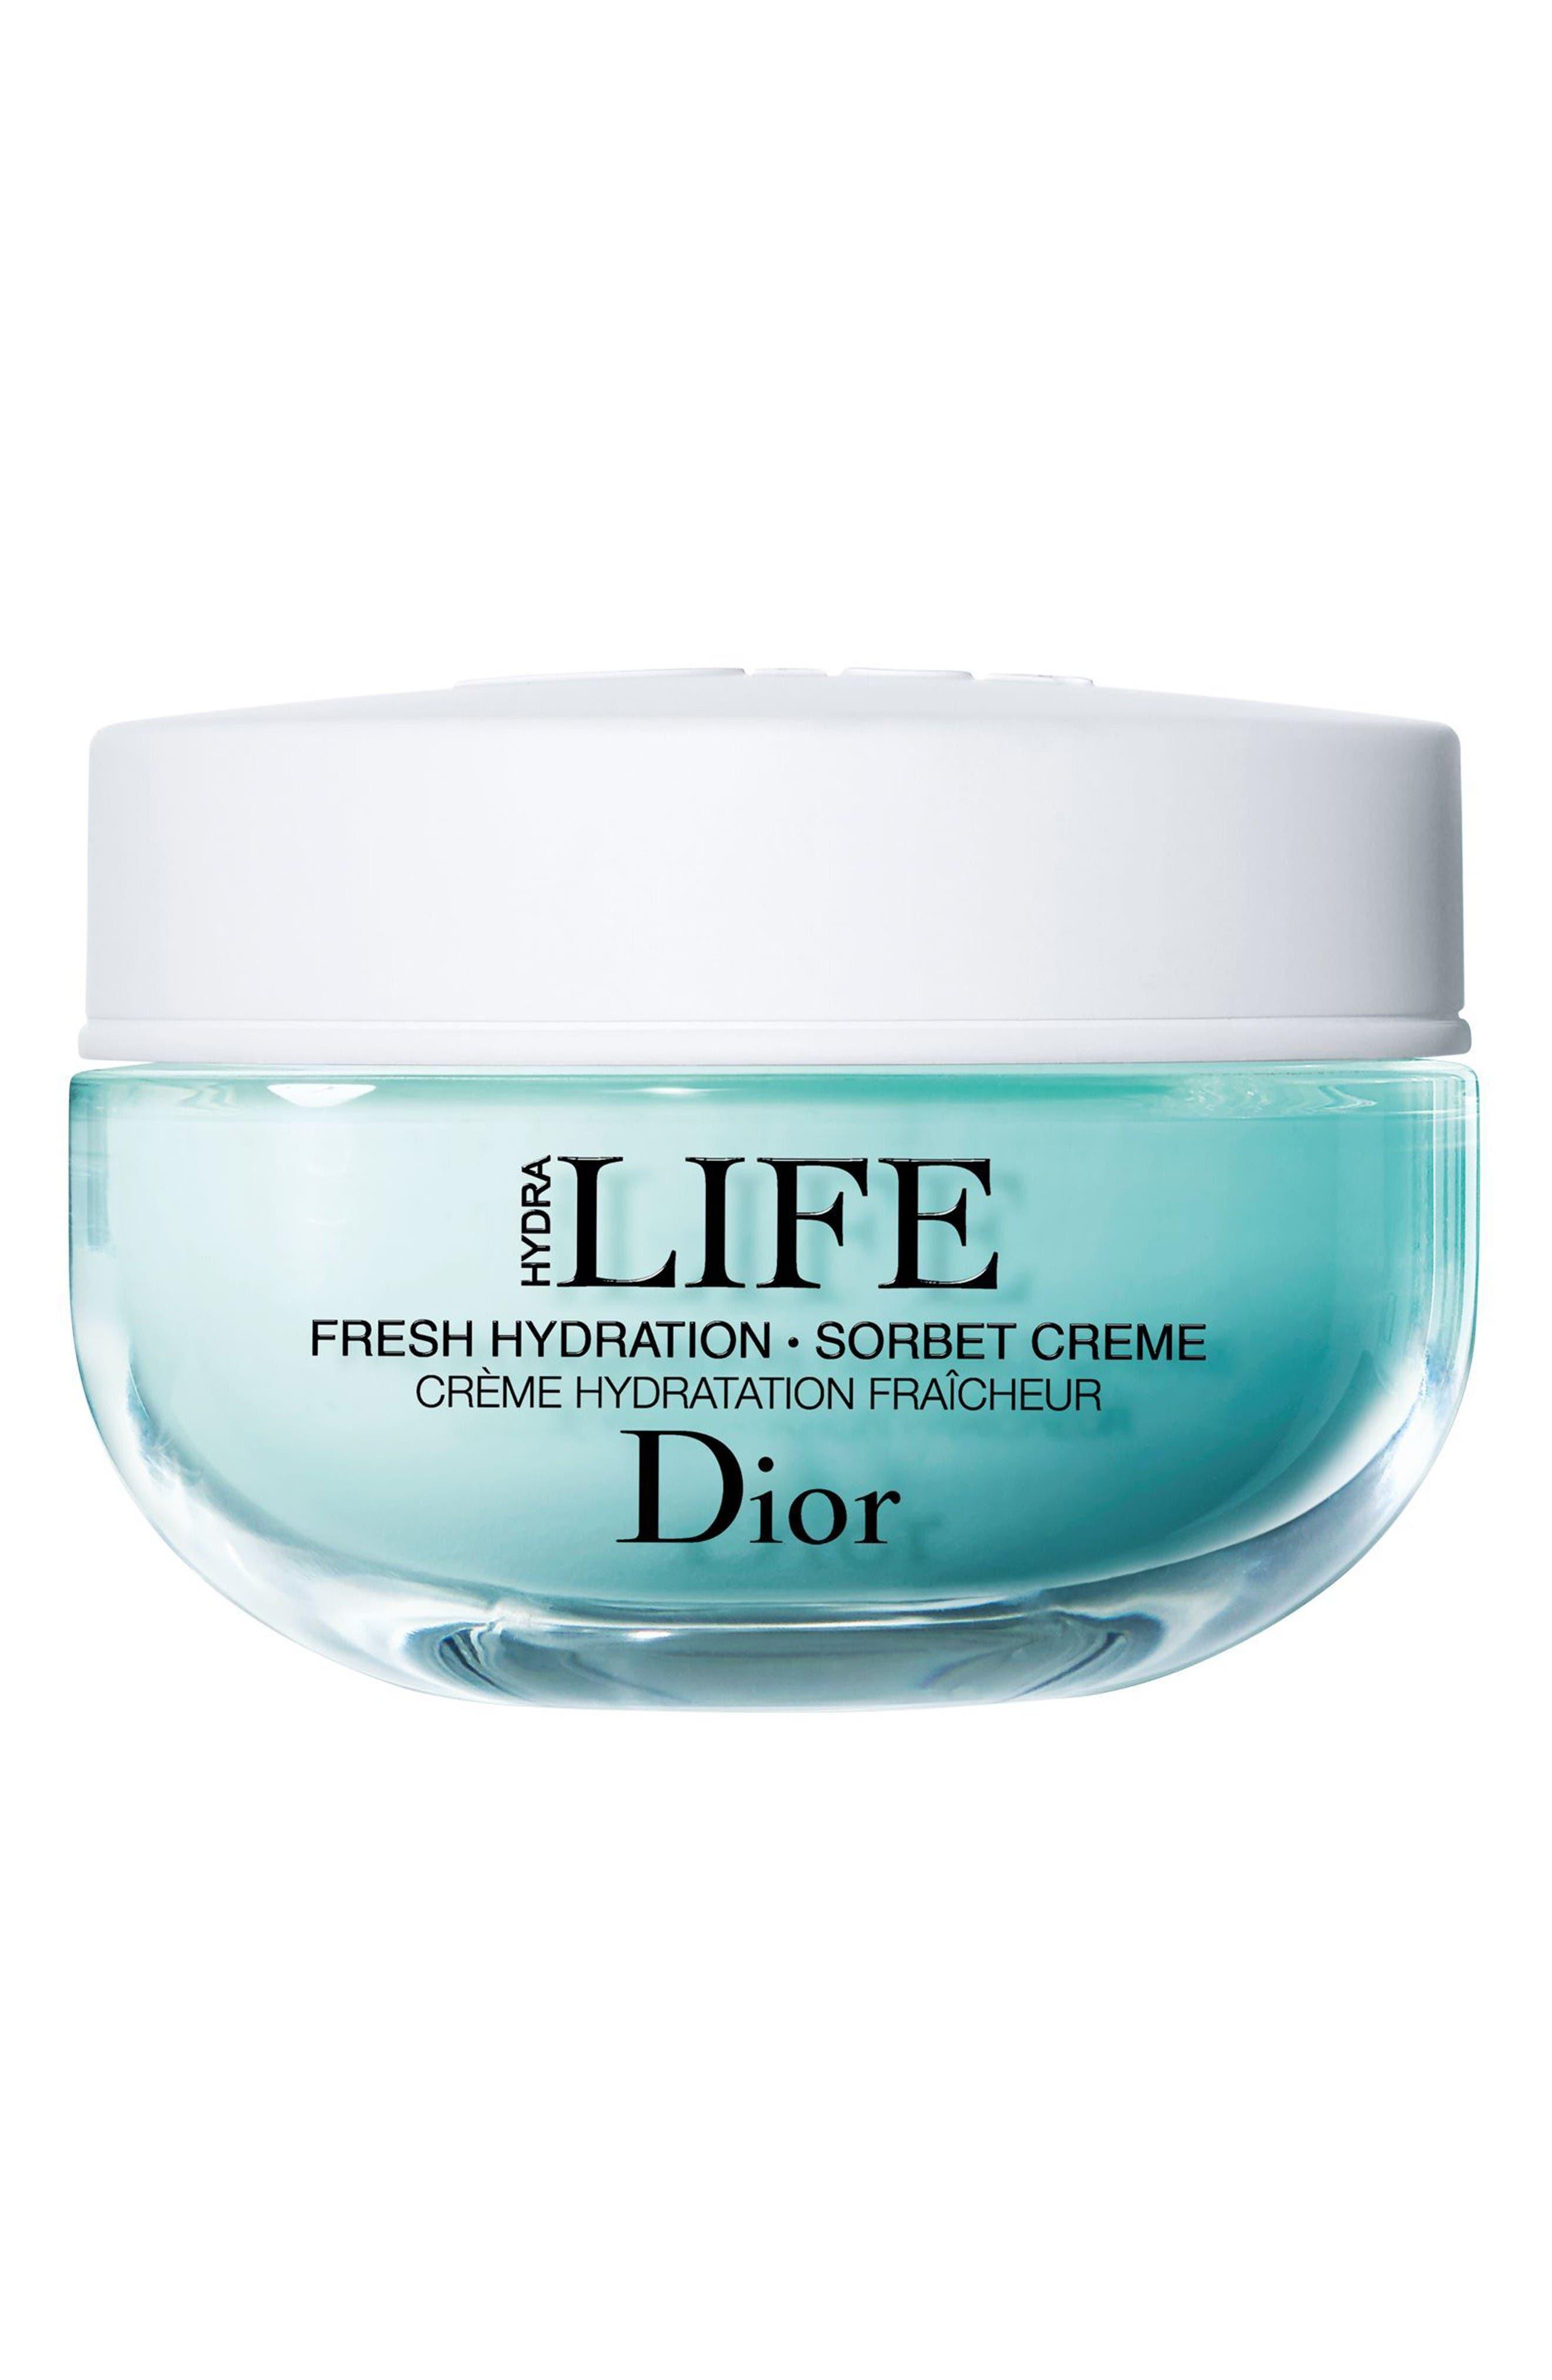 Dior Hydra Life Fresh Sorbet Crème